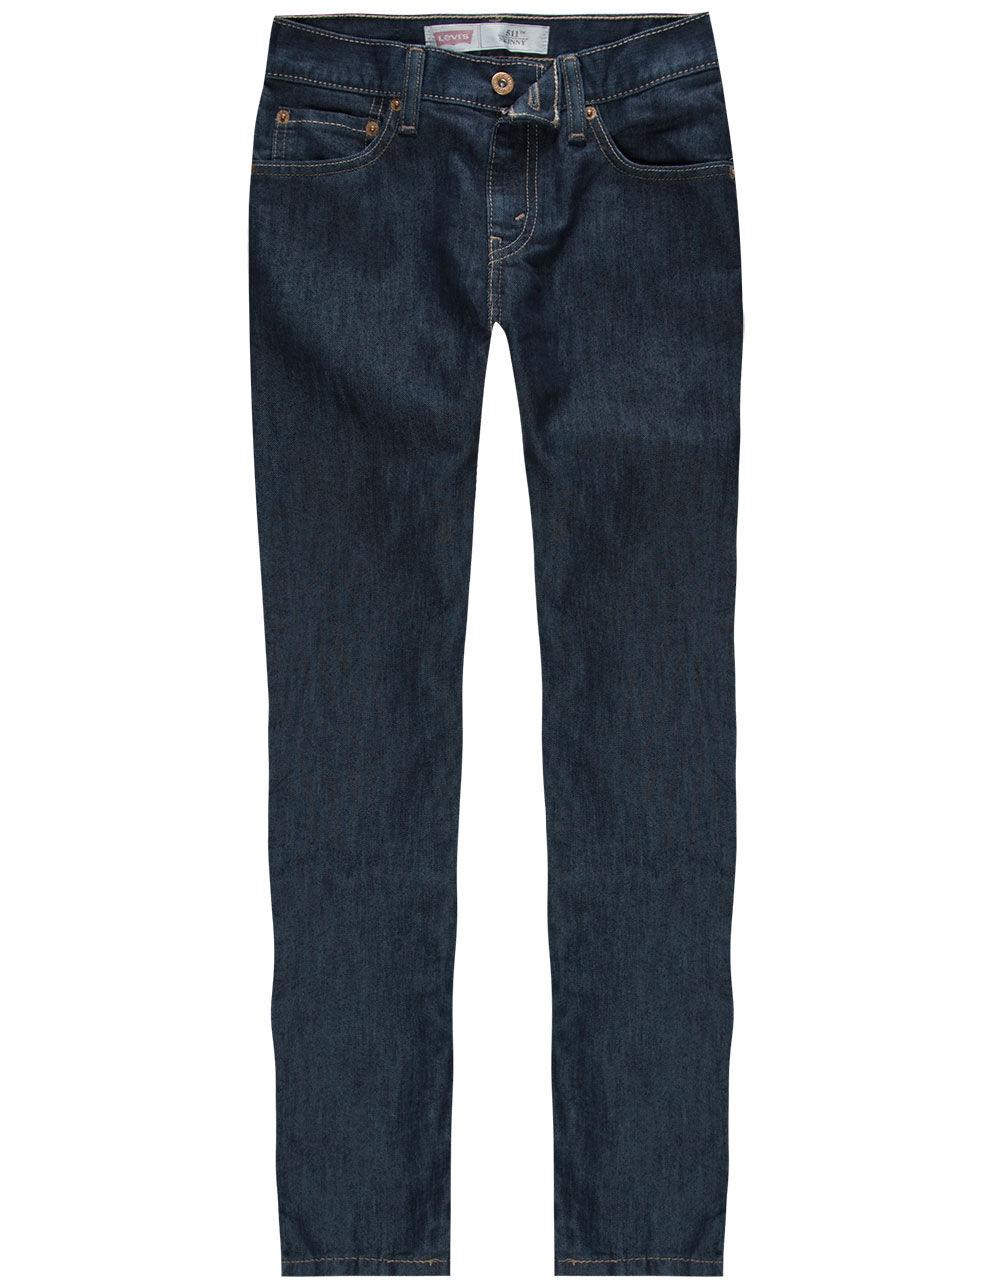 LEVI'S 511 Bacano Boys Slim Jeans